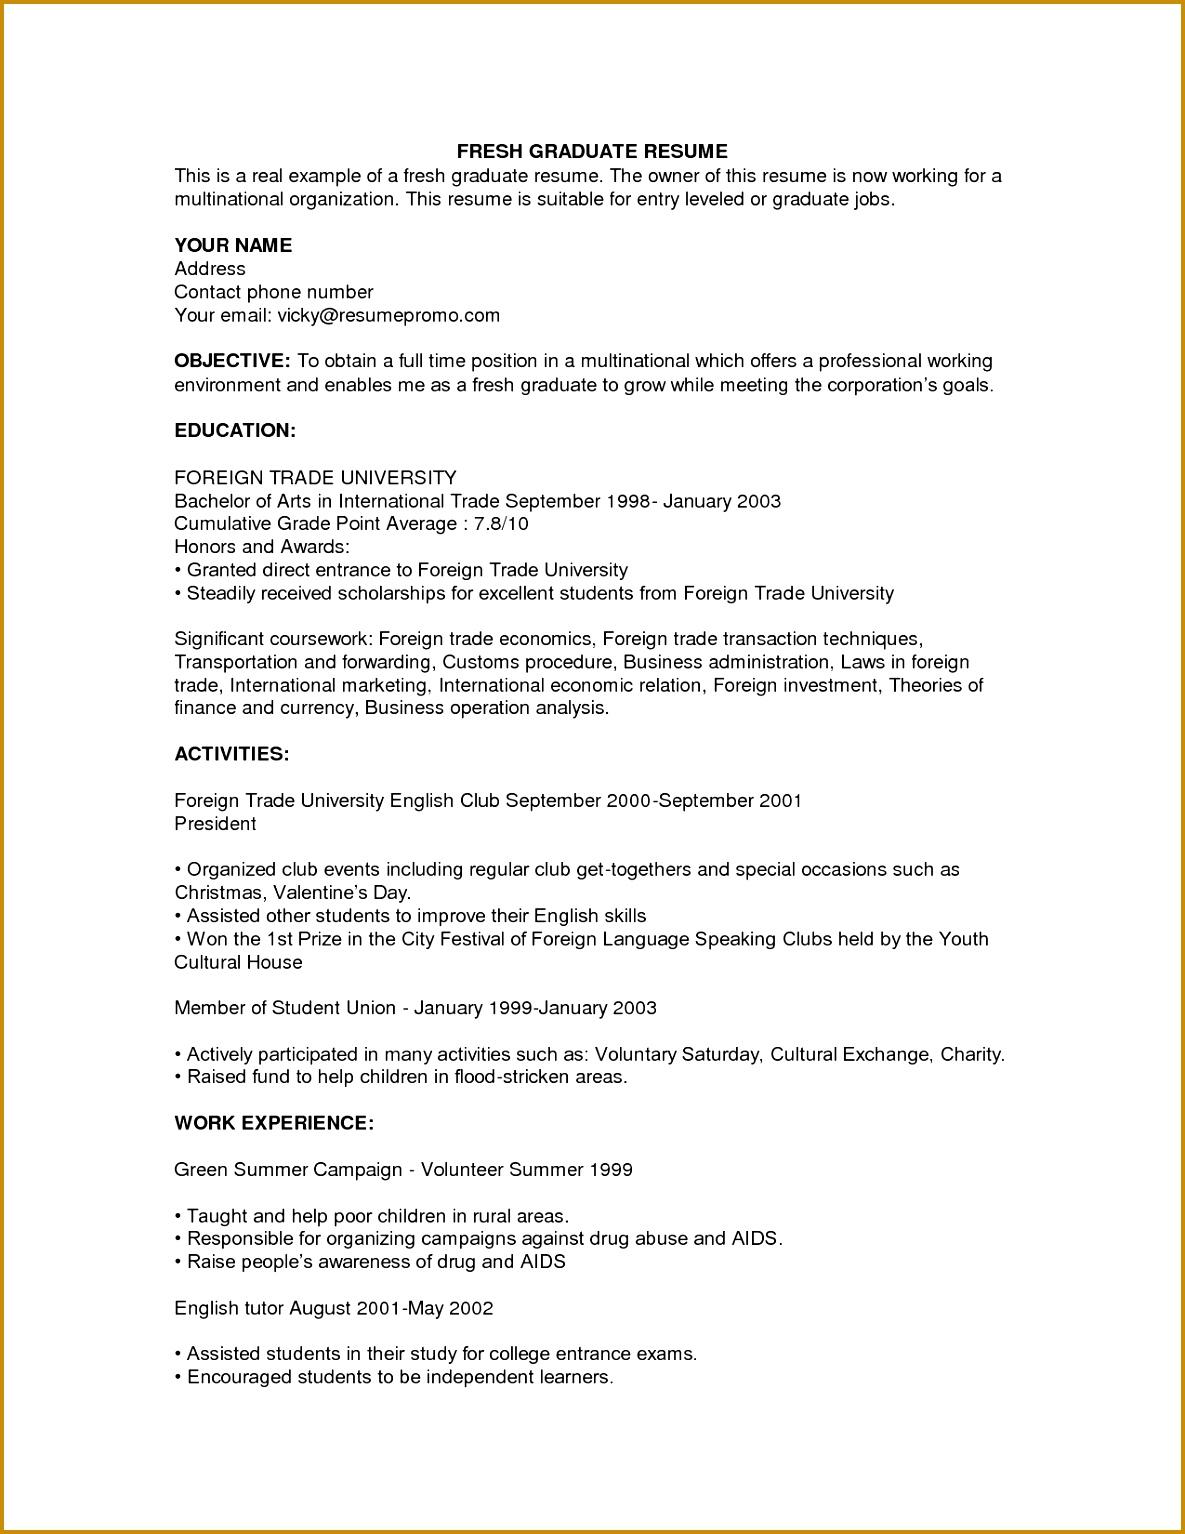 Sample College Admissions Resume Creating Resume Get Into College Free Sample Resume Cover college grad resume 15341185